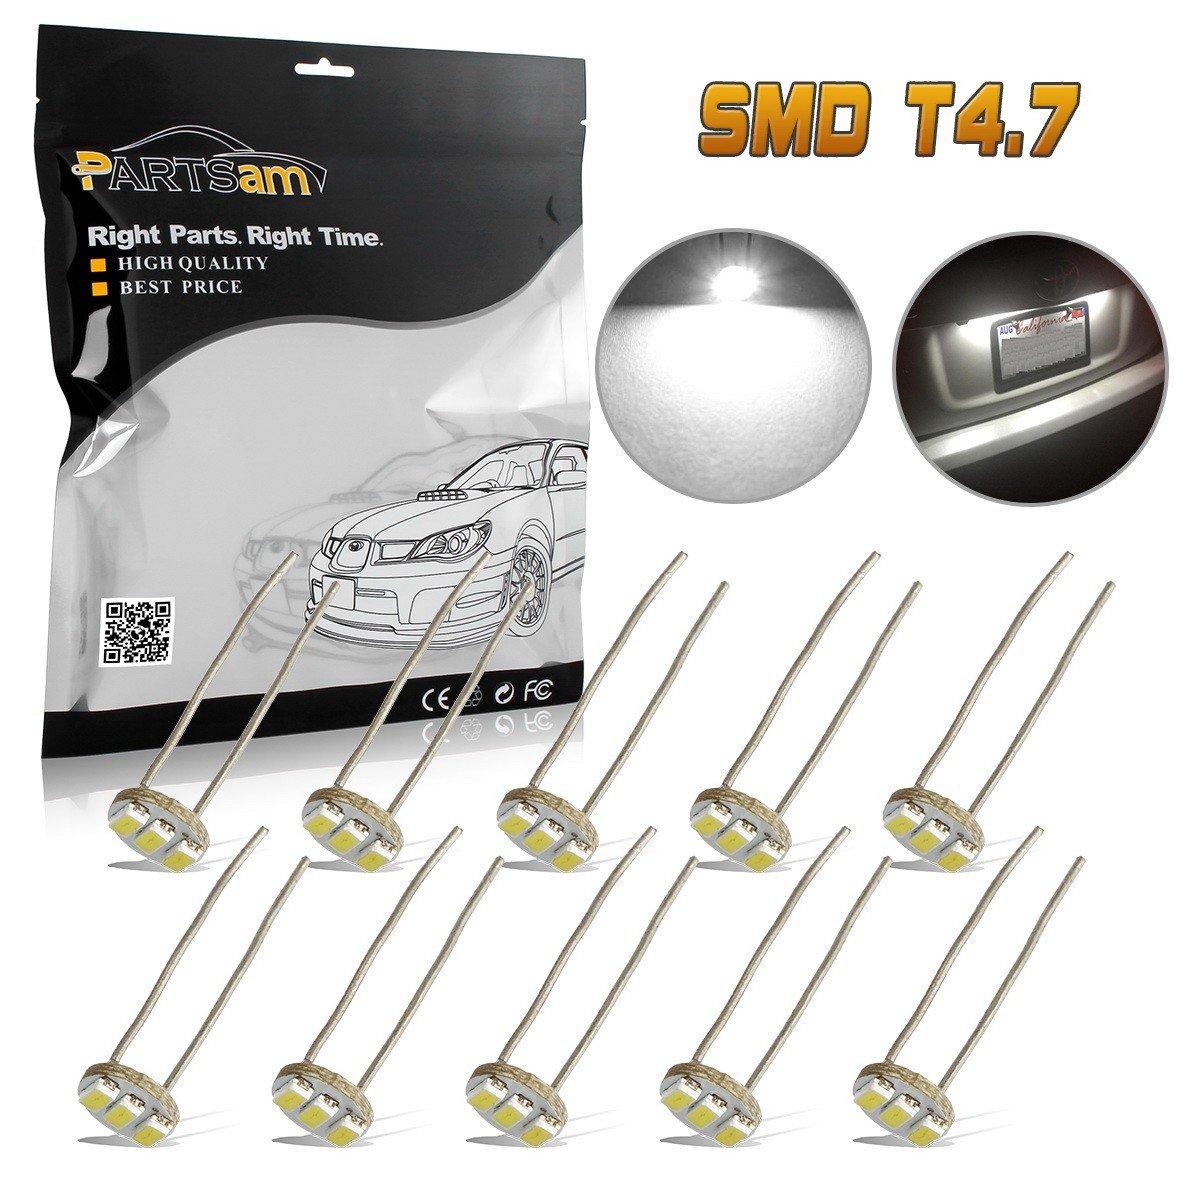 Partsam 10Pcs White 4.7mm Mini LED Bulbs Instrument Cluster Panel Backlight Gauge Lights 12V 95ma